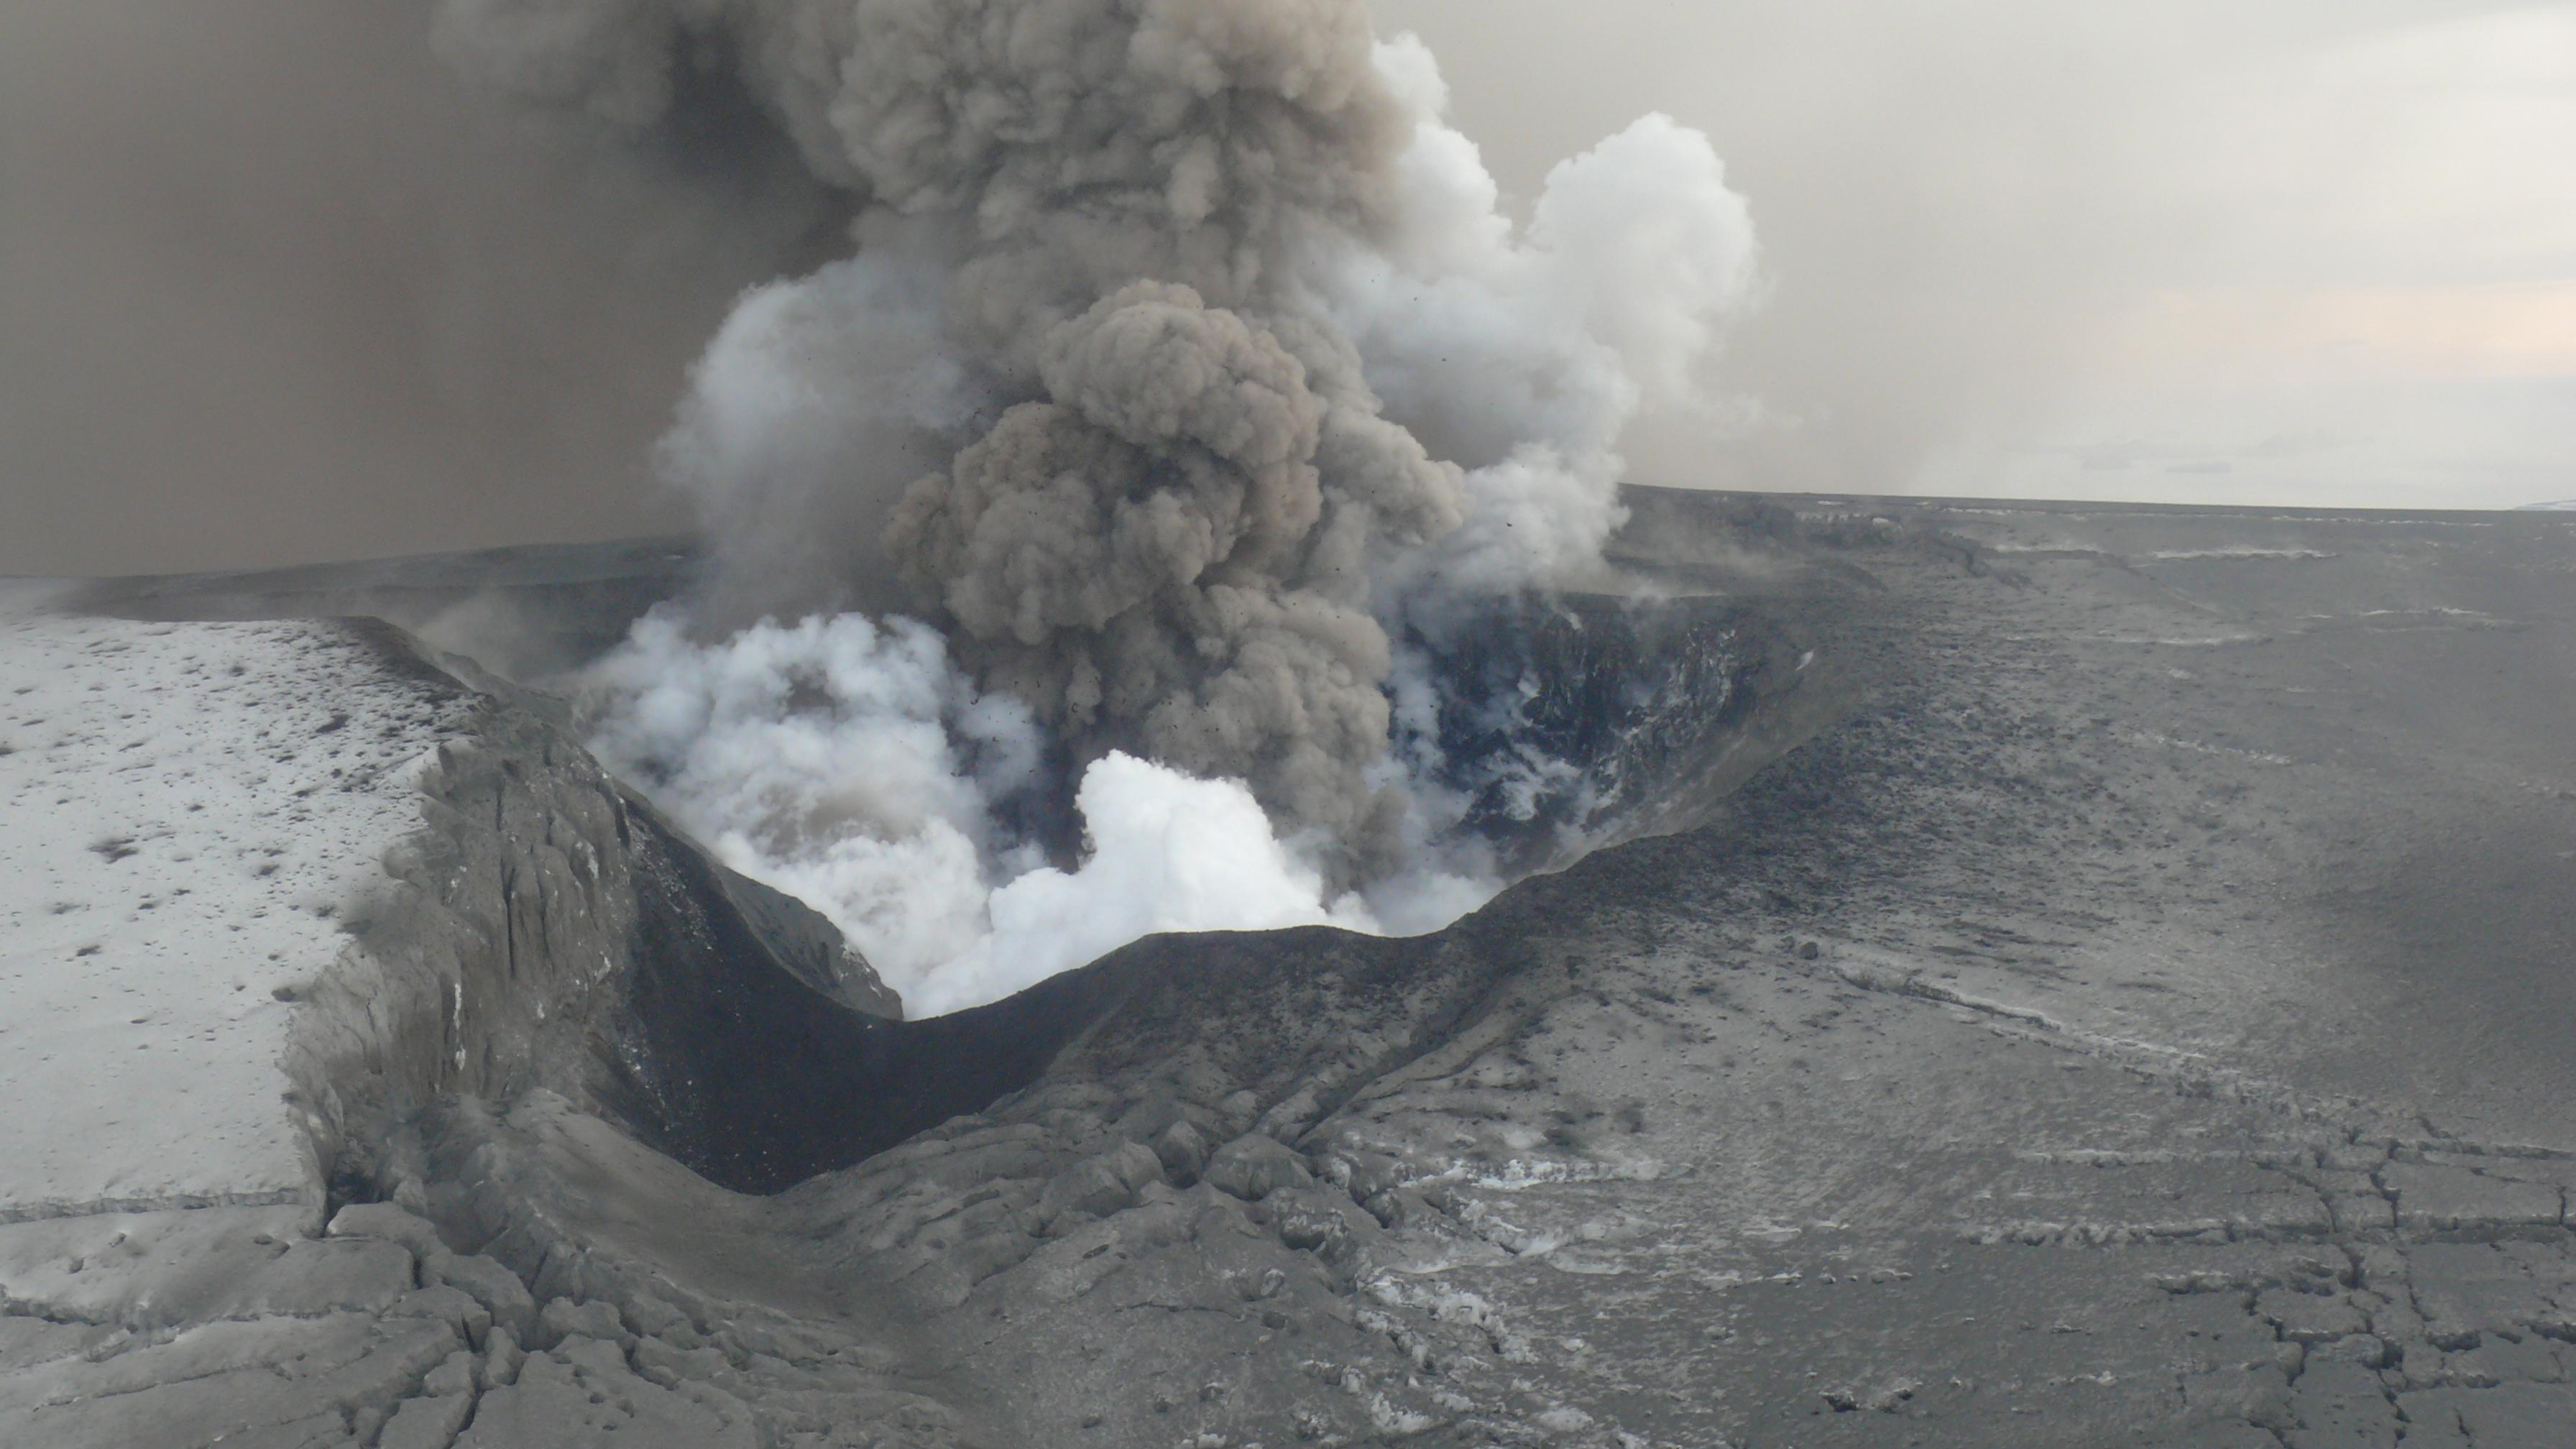 Island, Vulkanausbruch, Eyjafjallajökull, Aschewolke